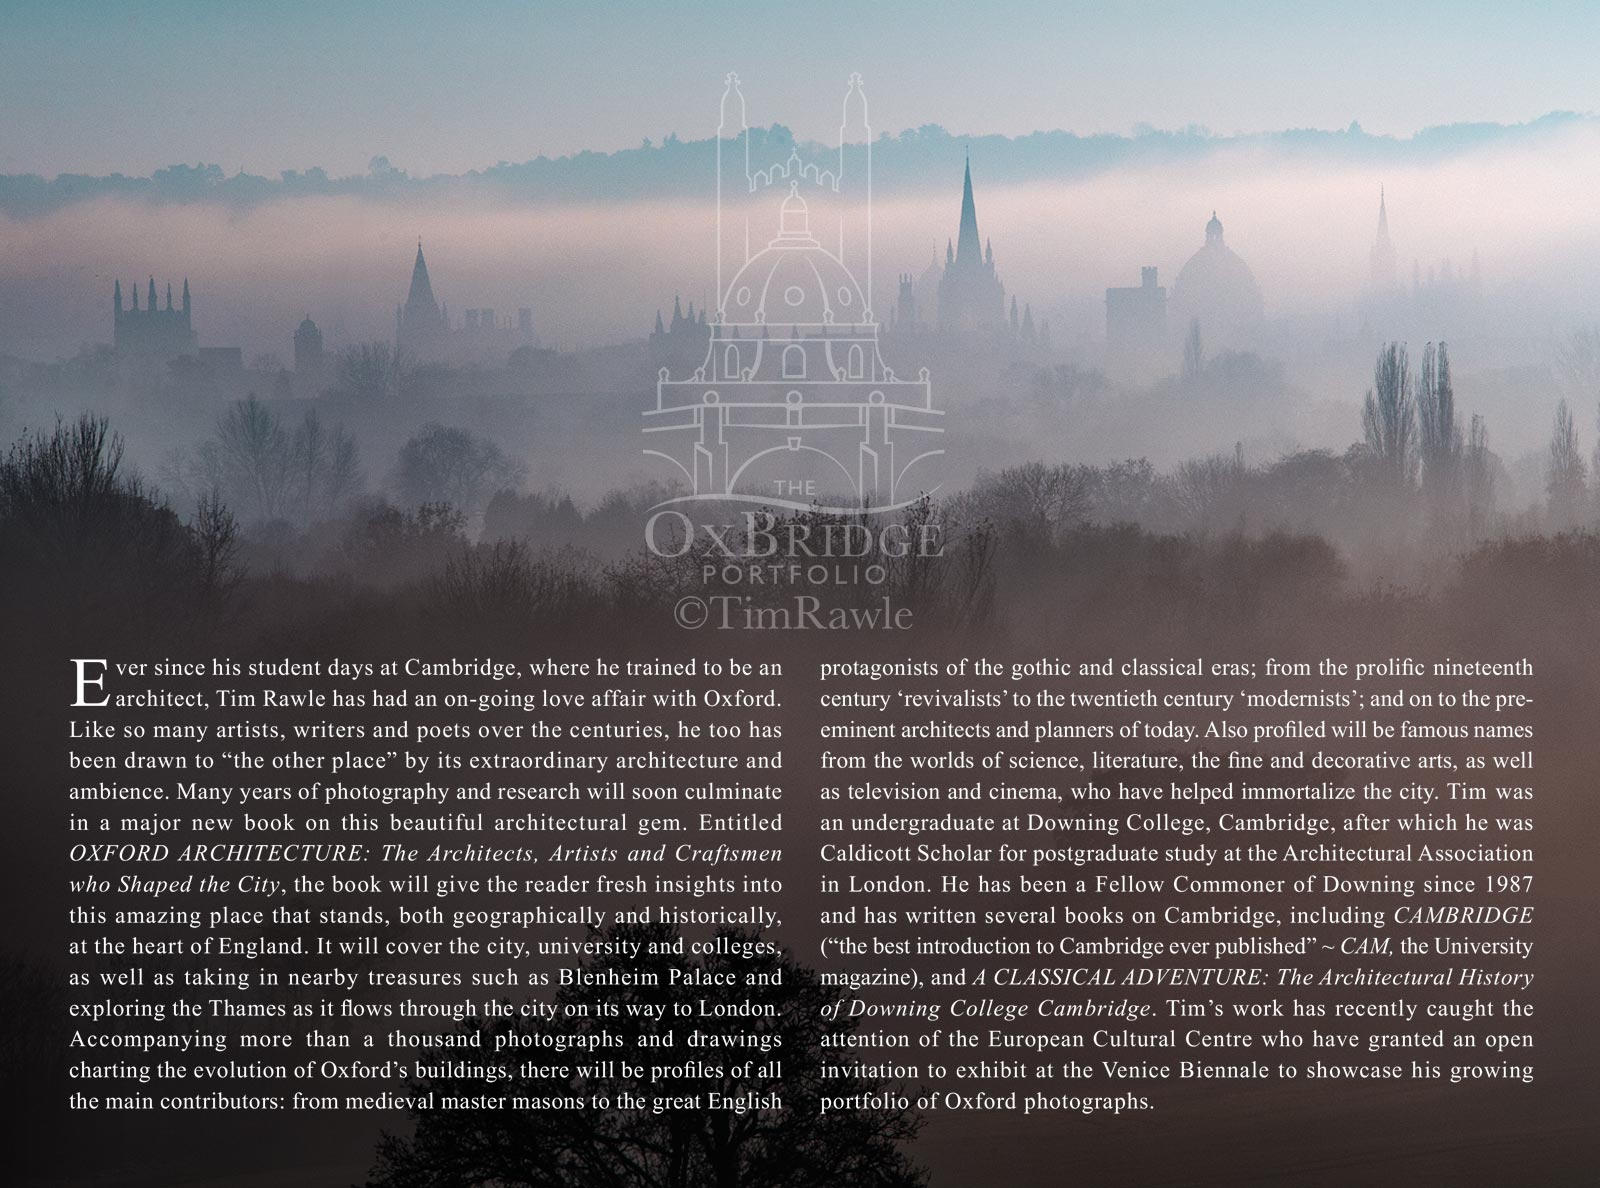 Books on oxford by Tim Rawle